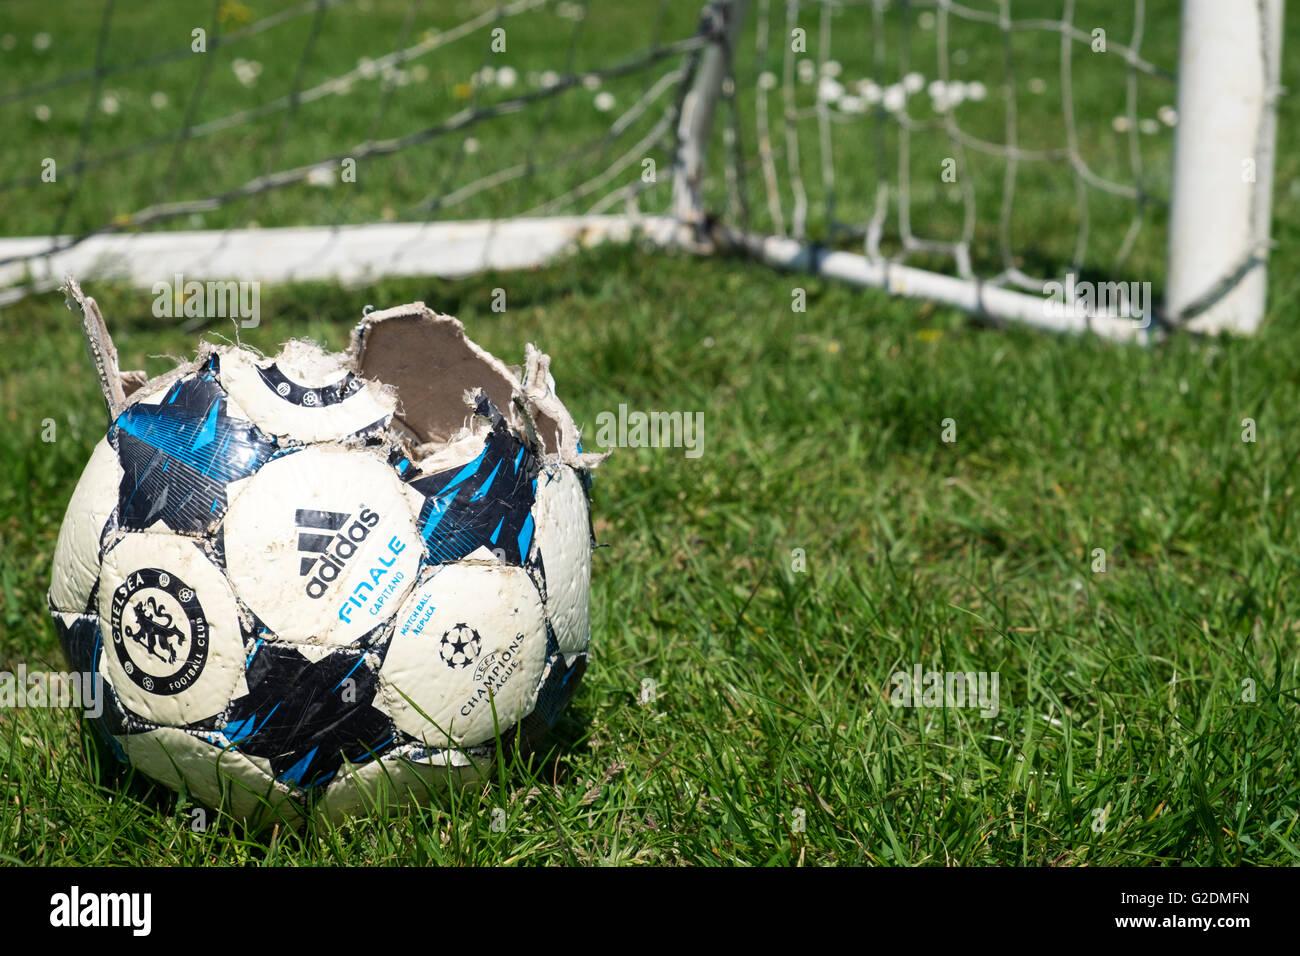 Adidas Finale Capitano football - Stock Image